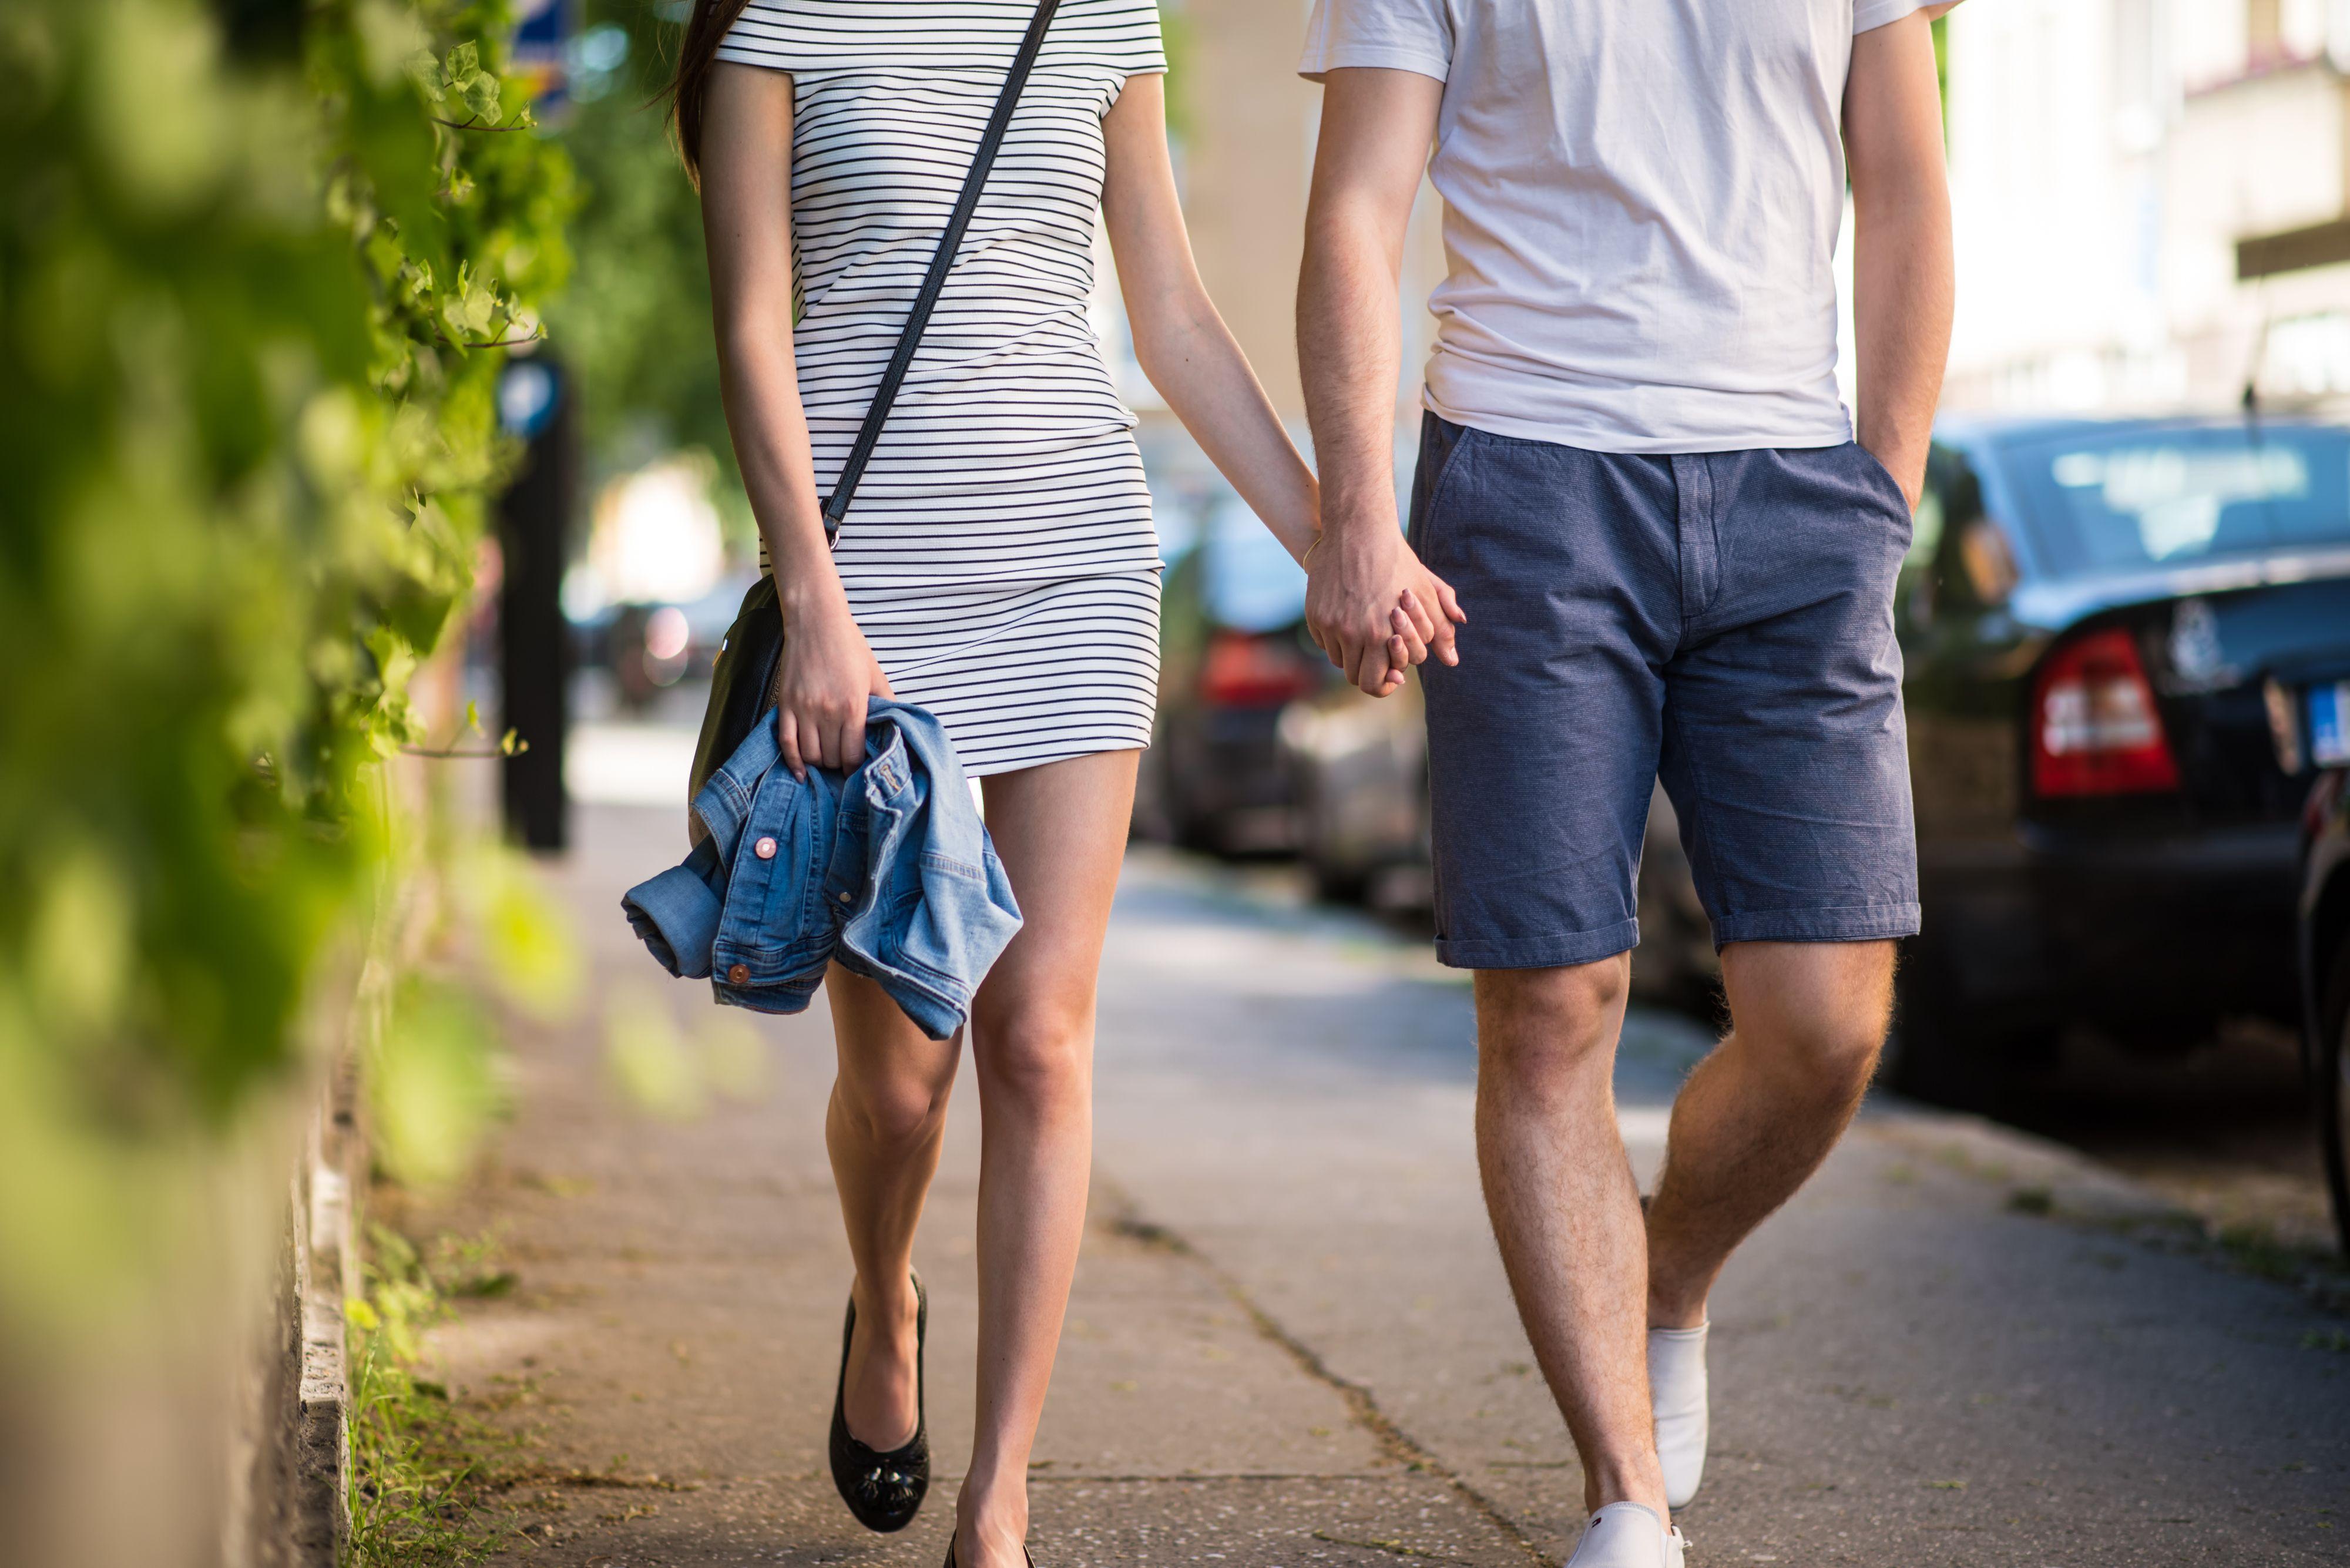 Sober dating plan Kristen dating fysisk intimitet